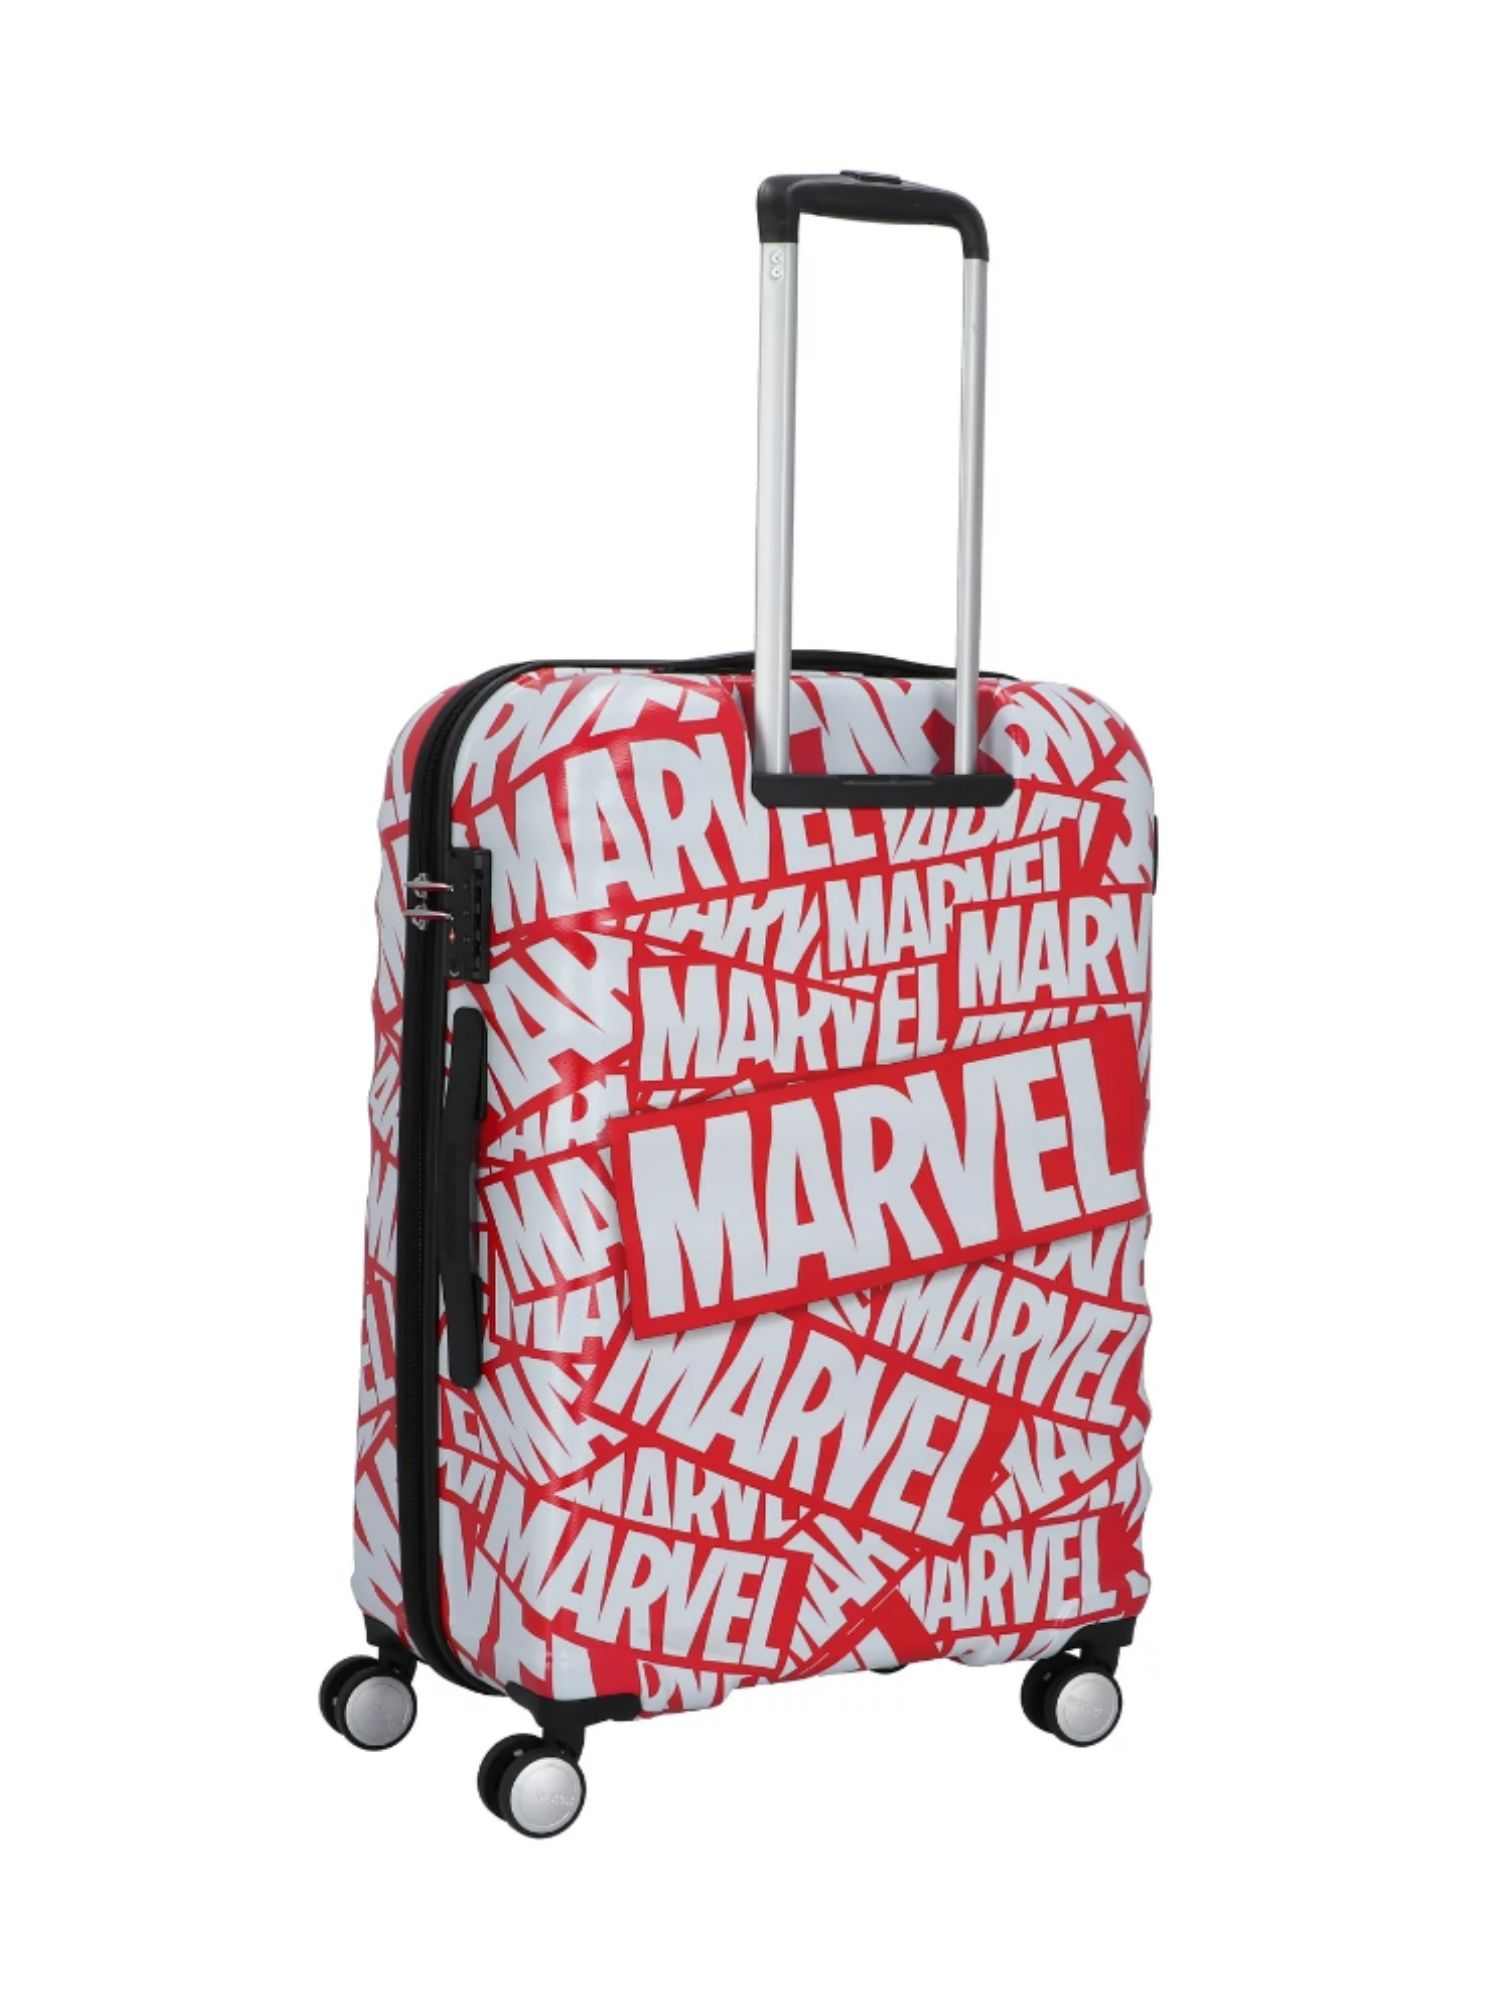 Trolley American Tourister 4 ruote 55 cm. Wavebreaker Disney Marvel Logo dettagli